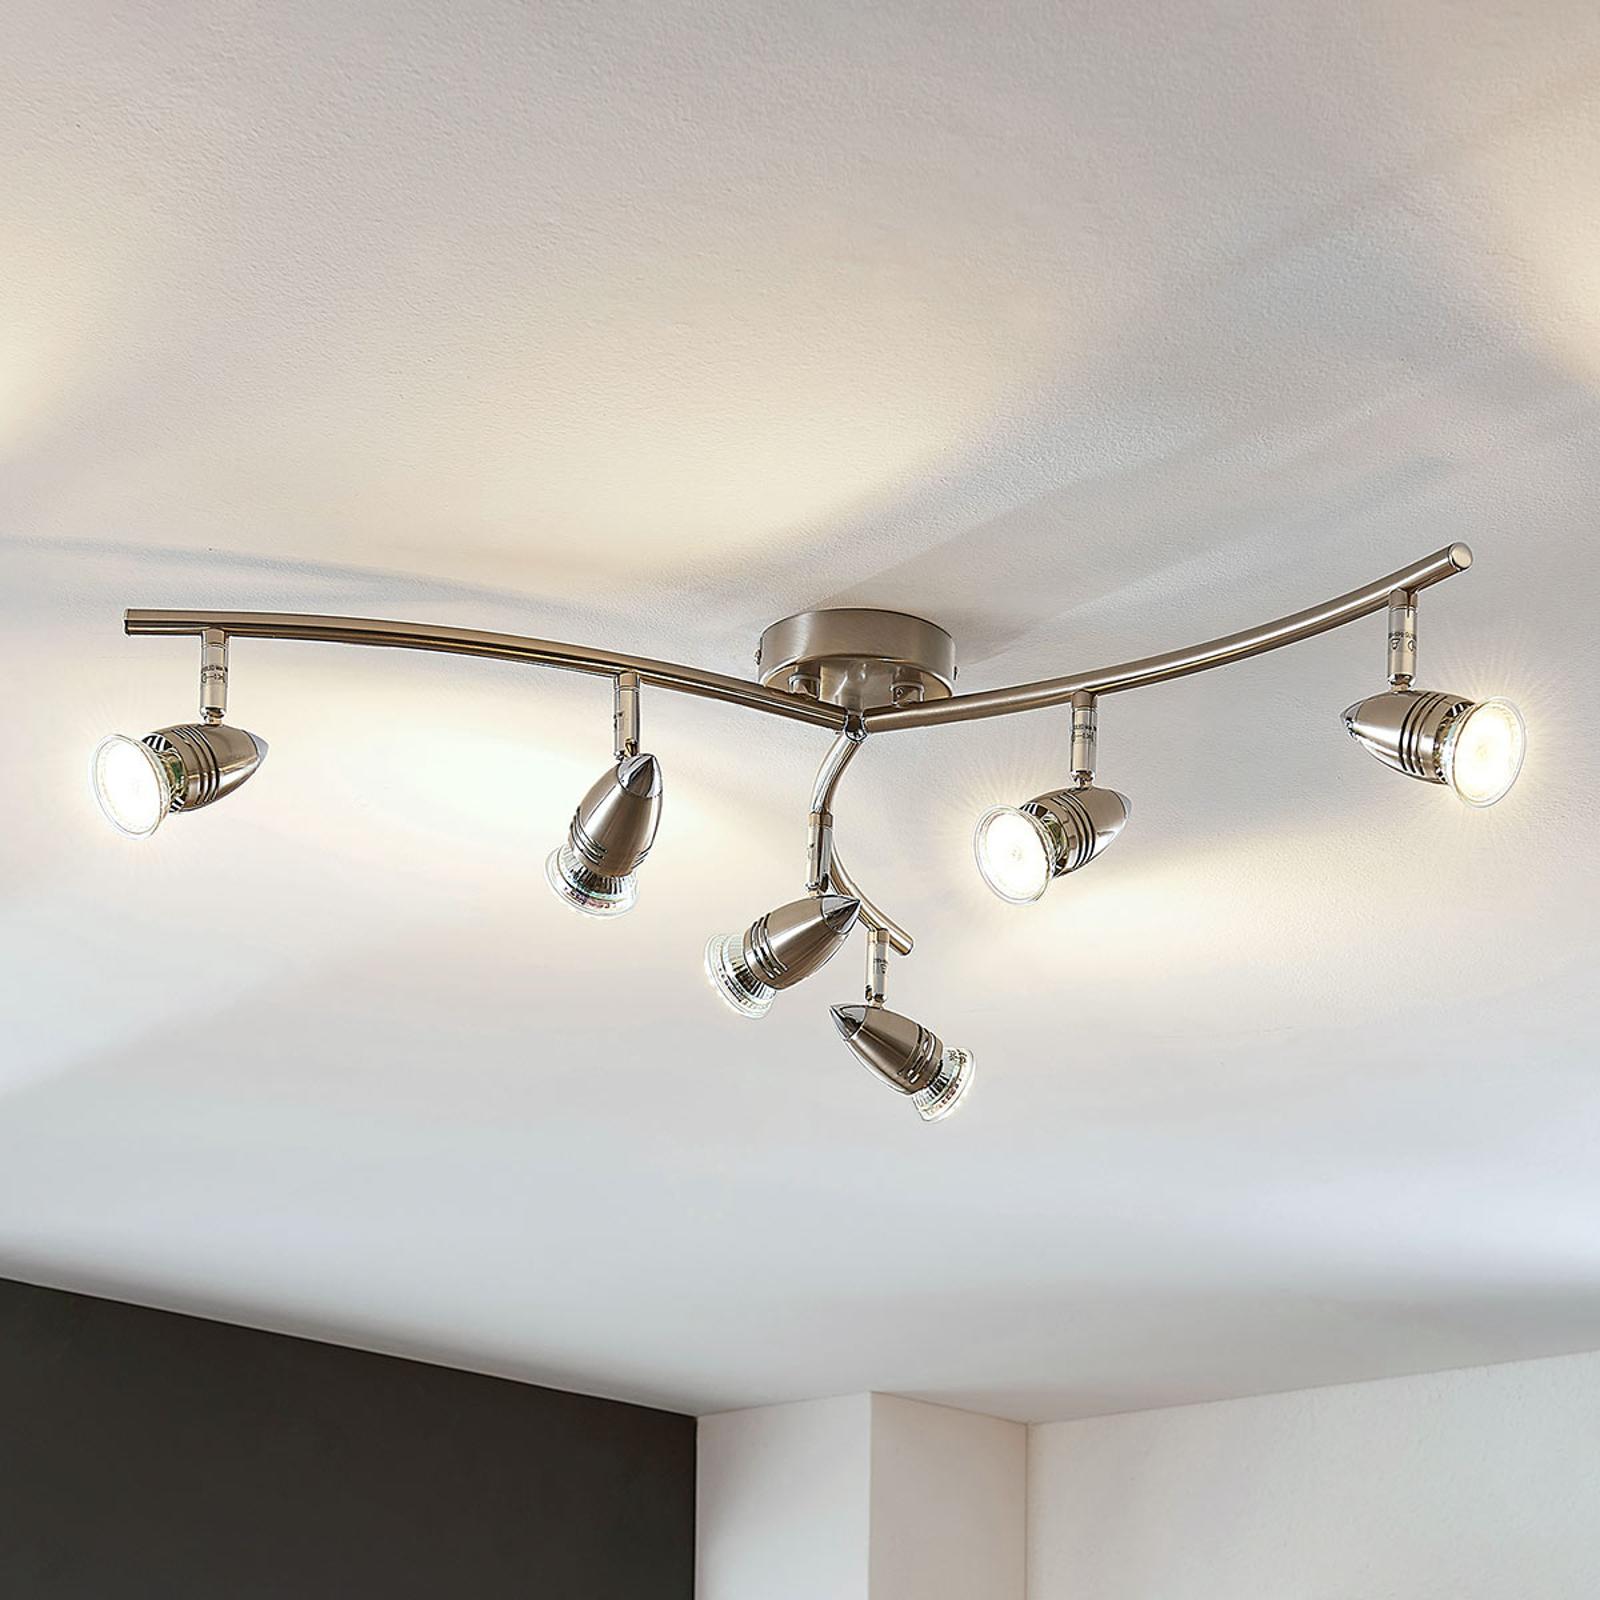 Spot pour plafond LED Benina à 6 lampes